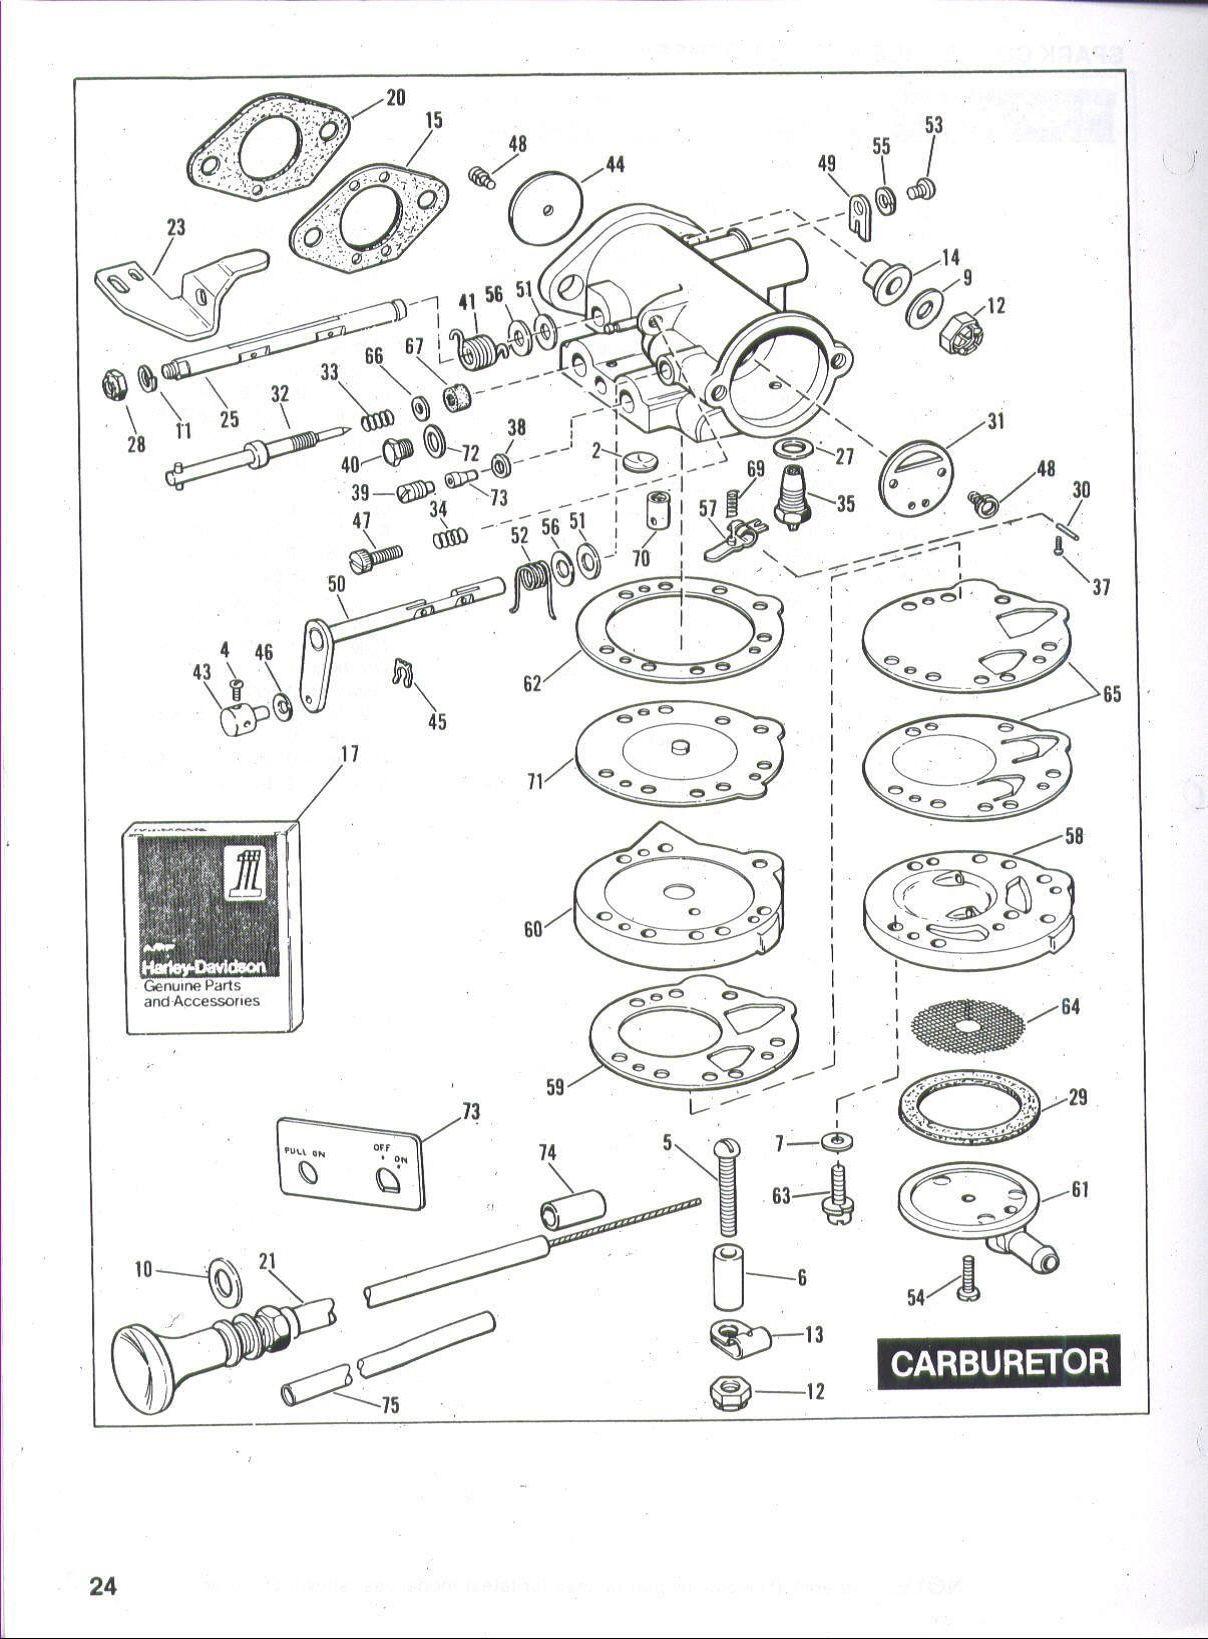 1985 ez go golf cart wiring diagram facial nerve pathway vintagegolfcartparts